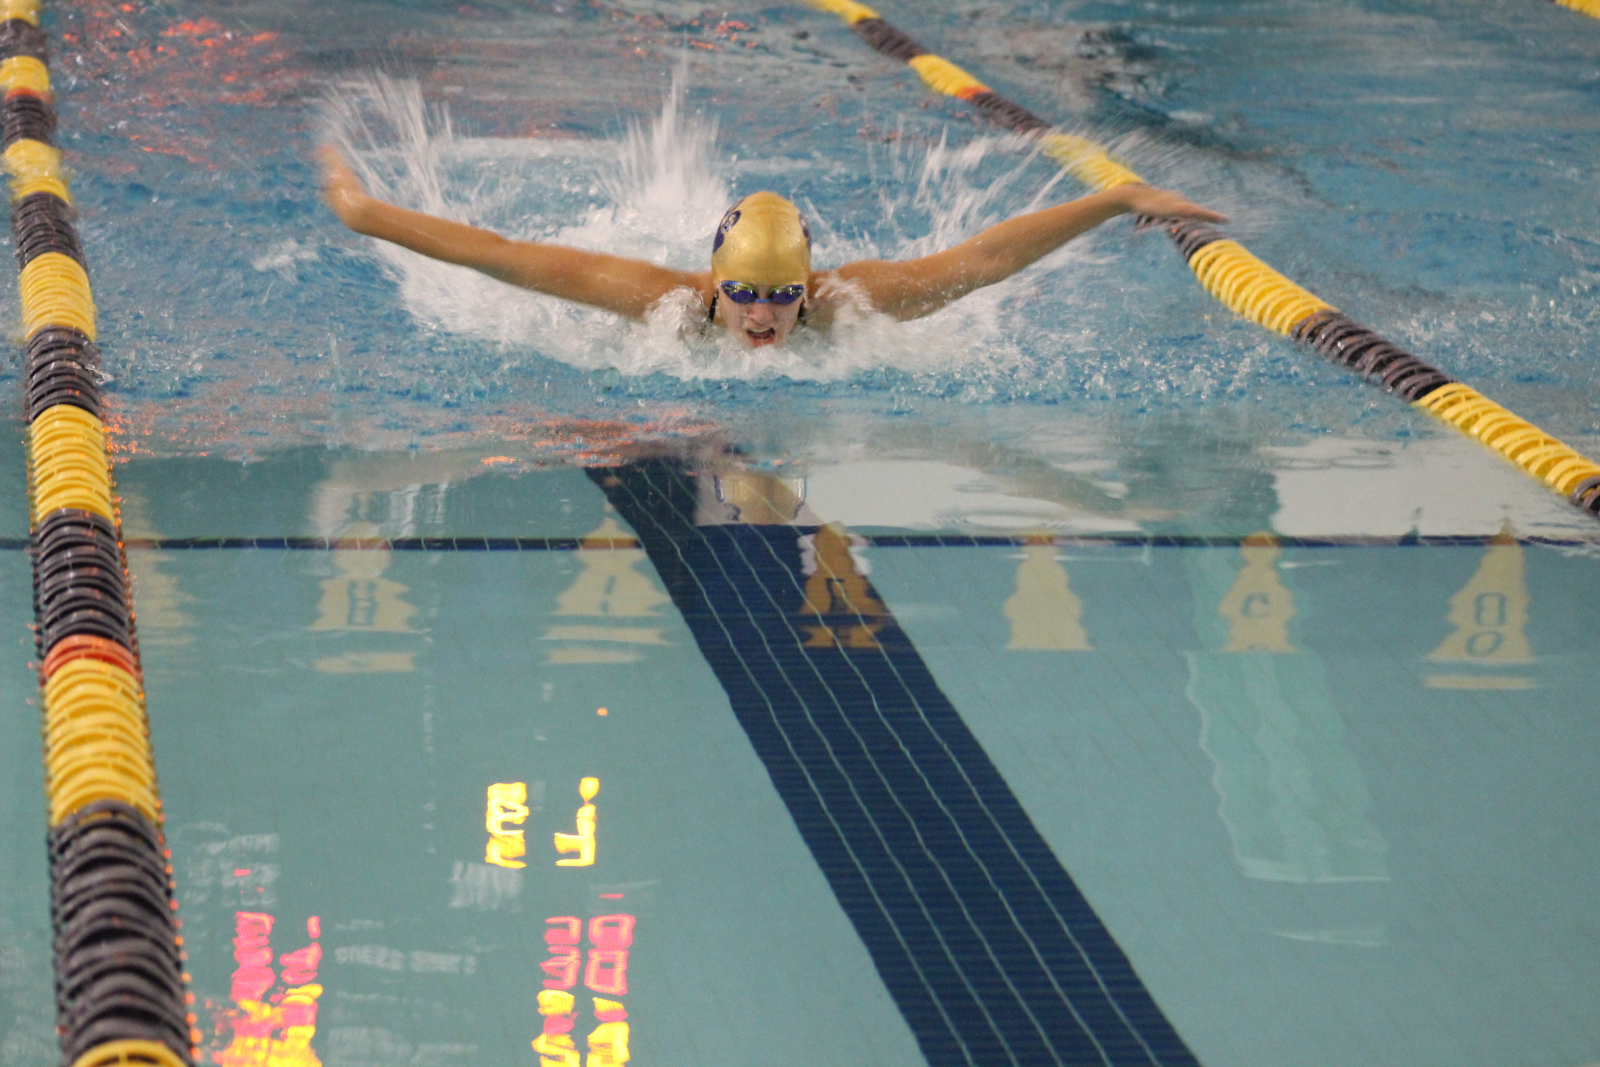 Swimming & Diving vs. Michigan City 12/5/20  (Photo Gallery 1 of 2)